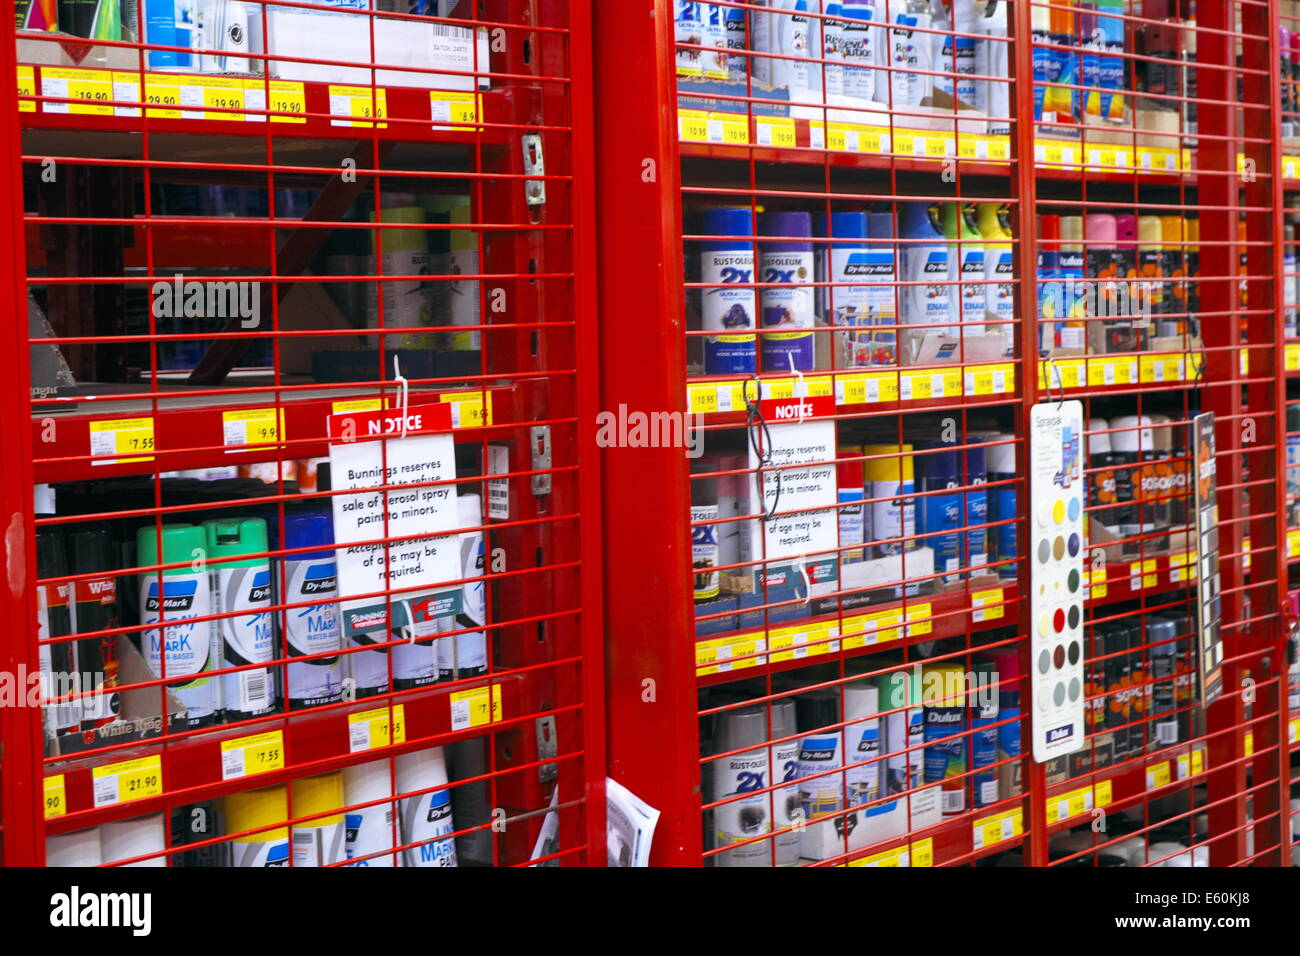 Plumbers Hardware Stock Photos & Plumbers Hardware Stock